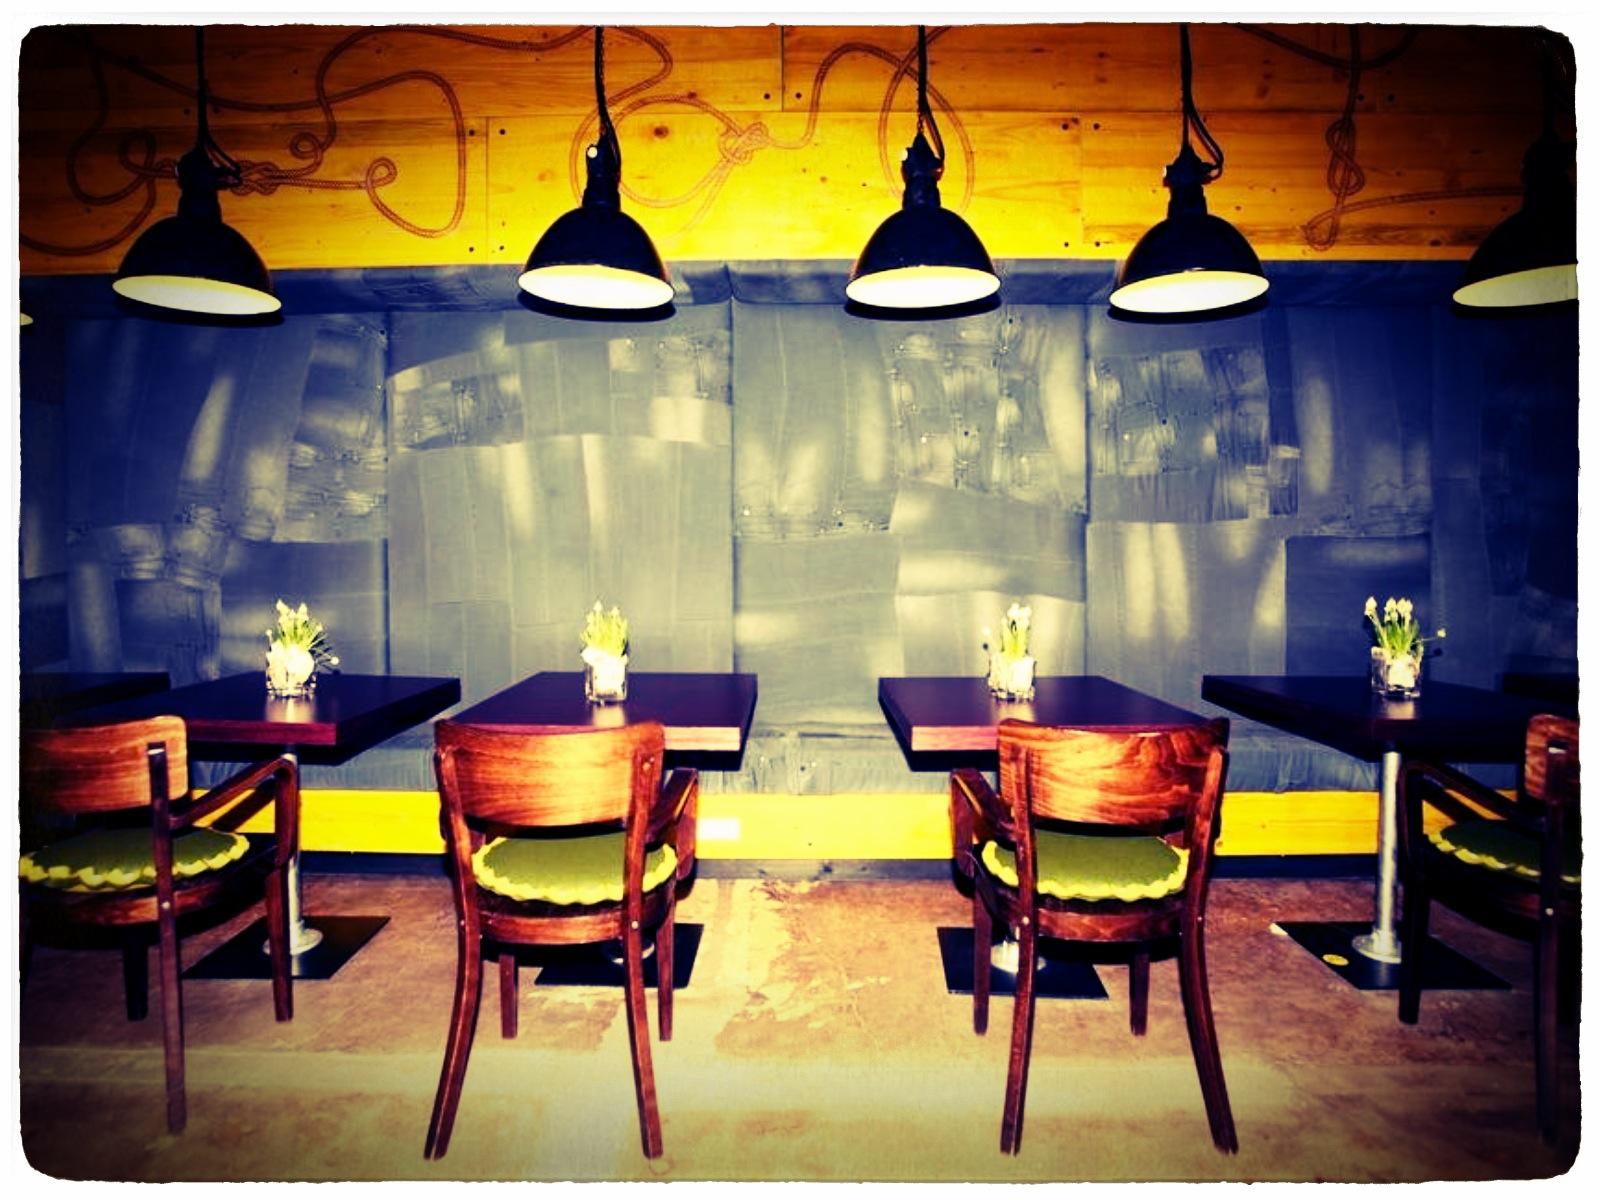 superbude st pauli hamburg photos ryans air adventures. Black Bedroom Furniture Sets. Home Design Ideas